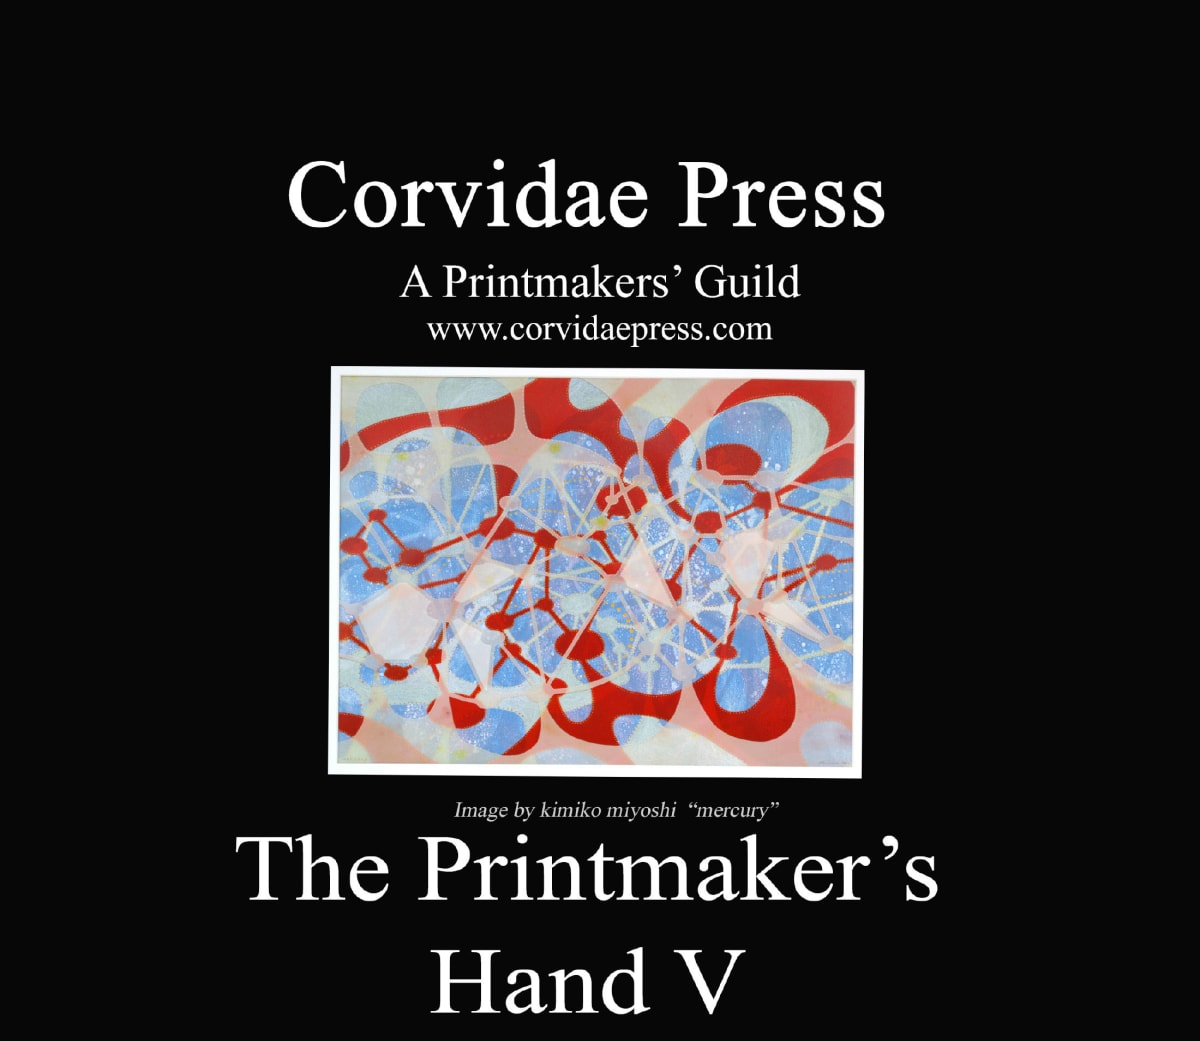 The Printmaker's Hand V: exhibition of original prints